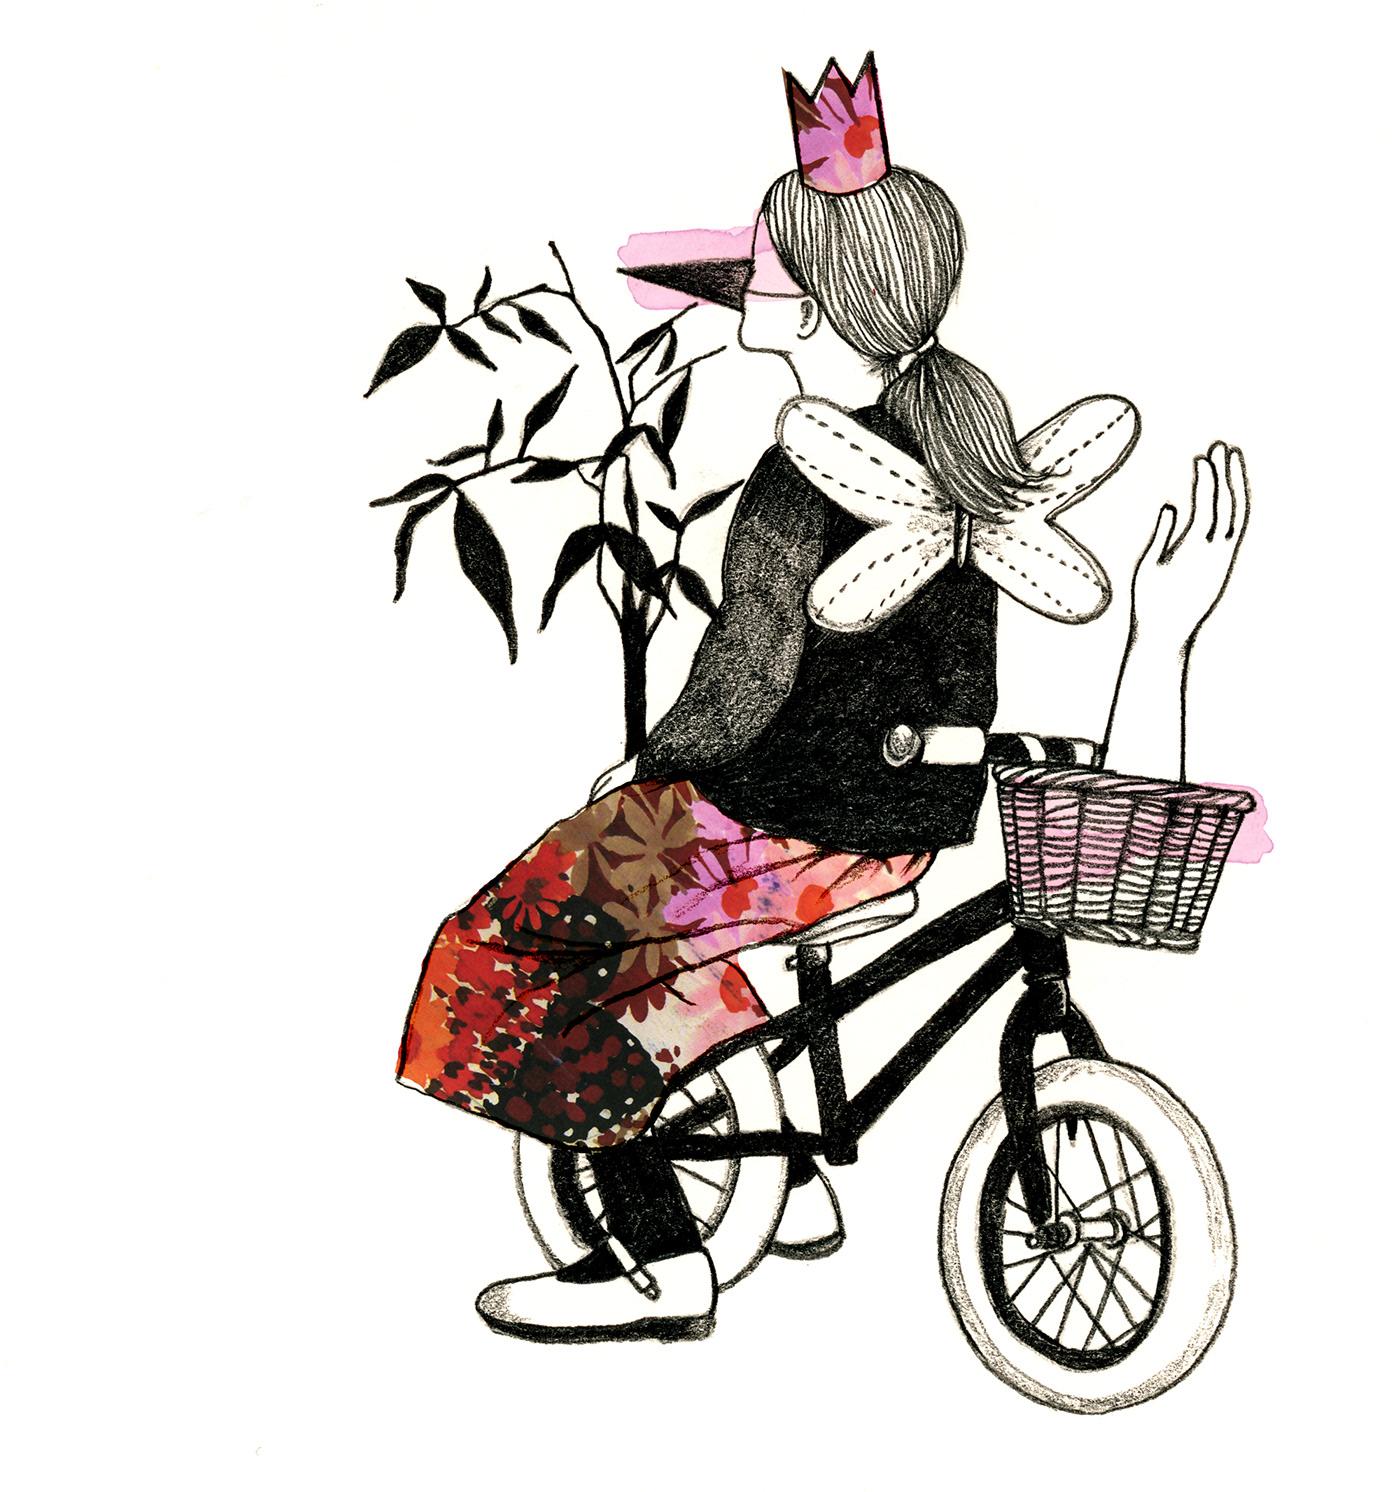 Image may contain: bicycle, cartoon and drawing